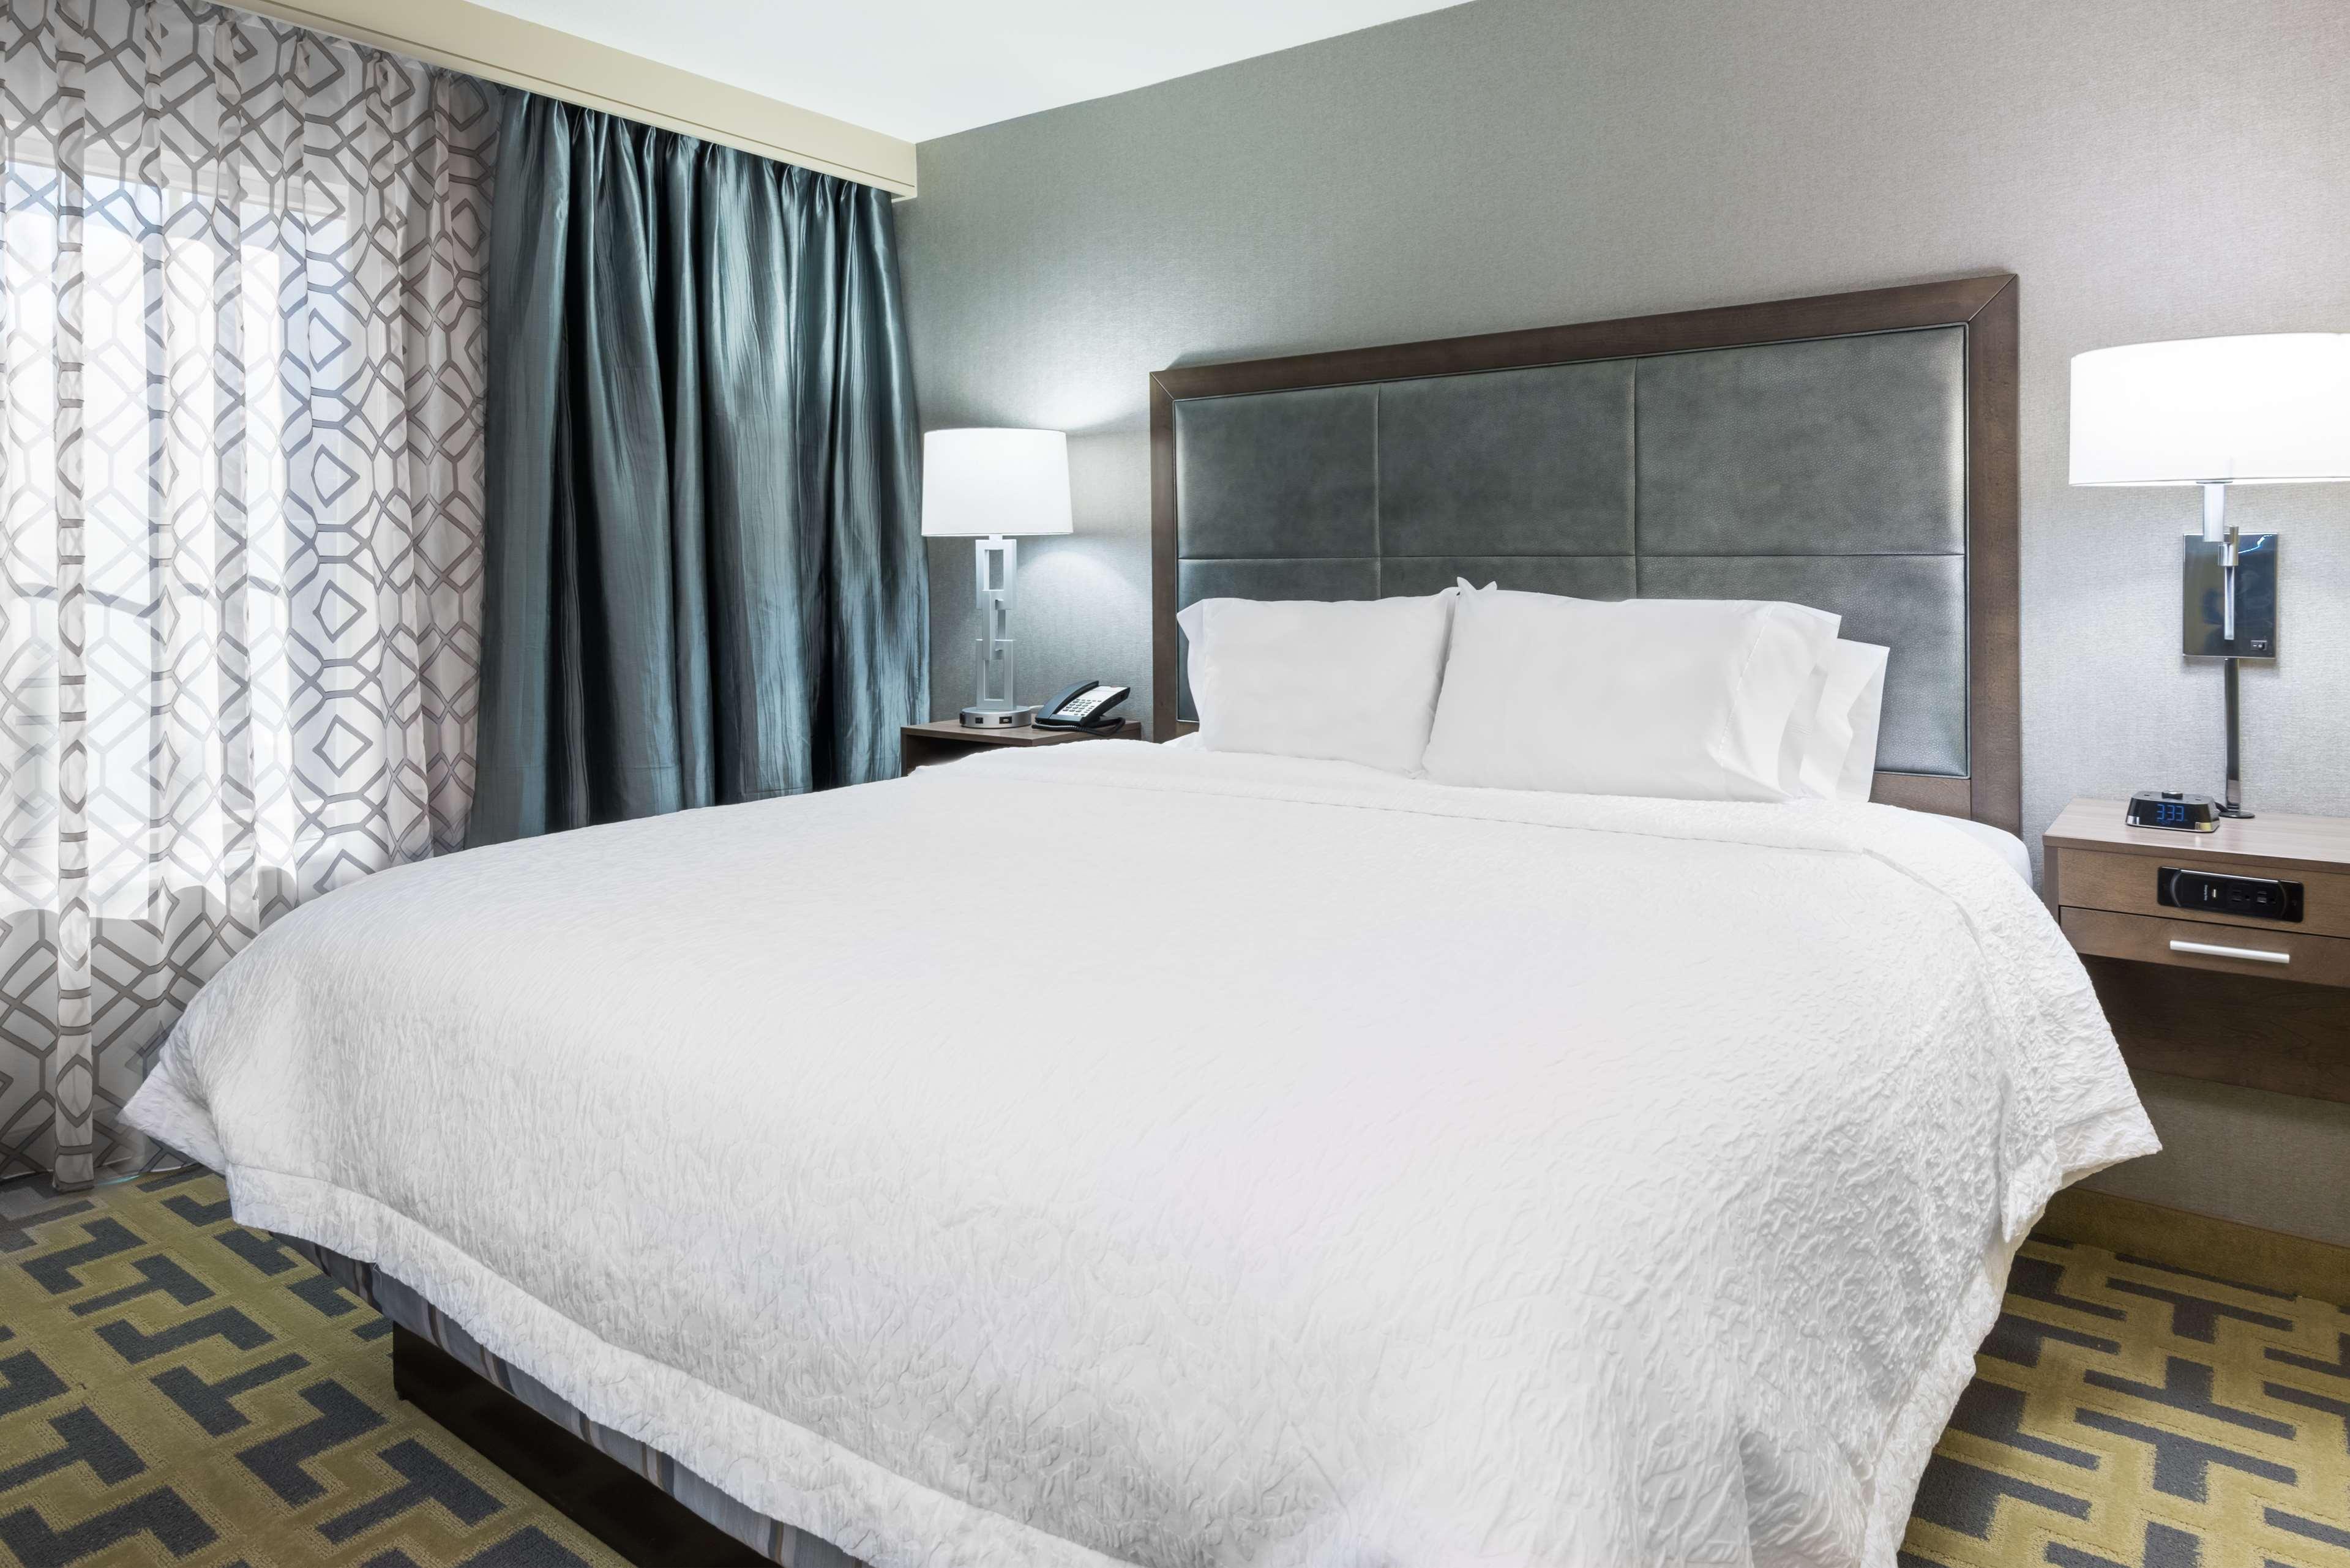 Hampton Inn & Suites Tampa Airport Avion Park Westshore image 19